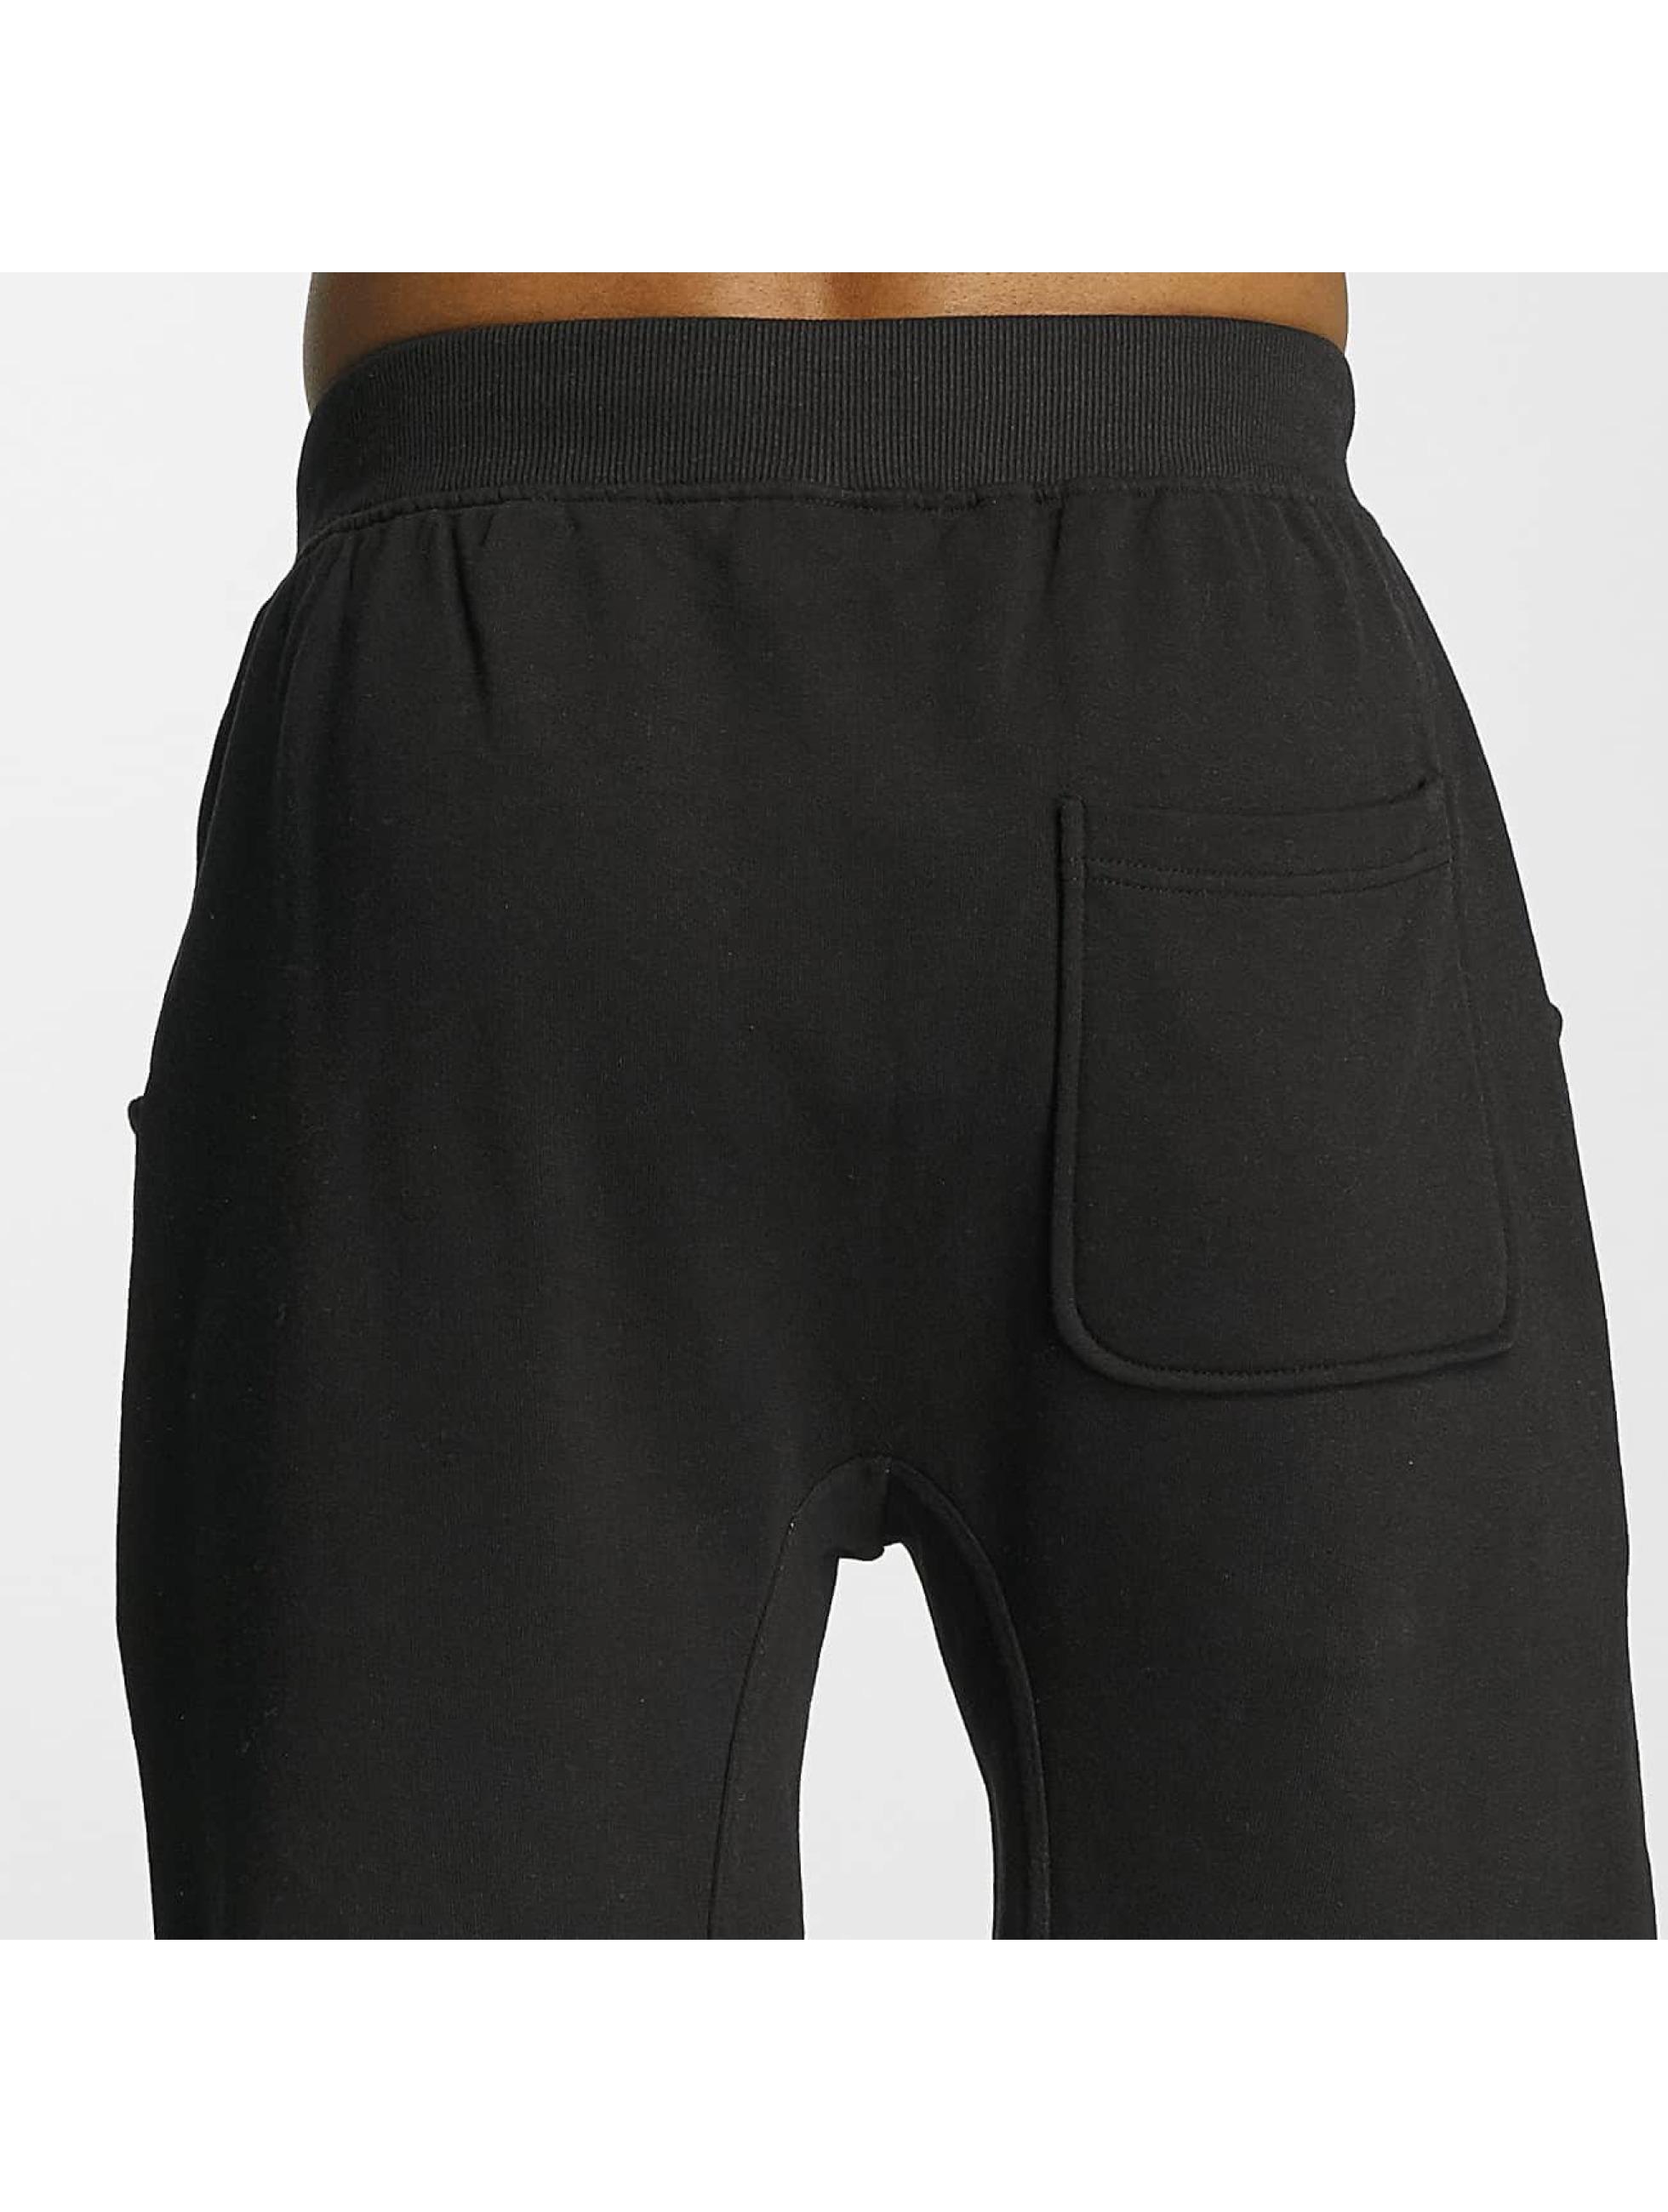 Kingin Shorts Anubis schwarz